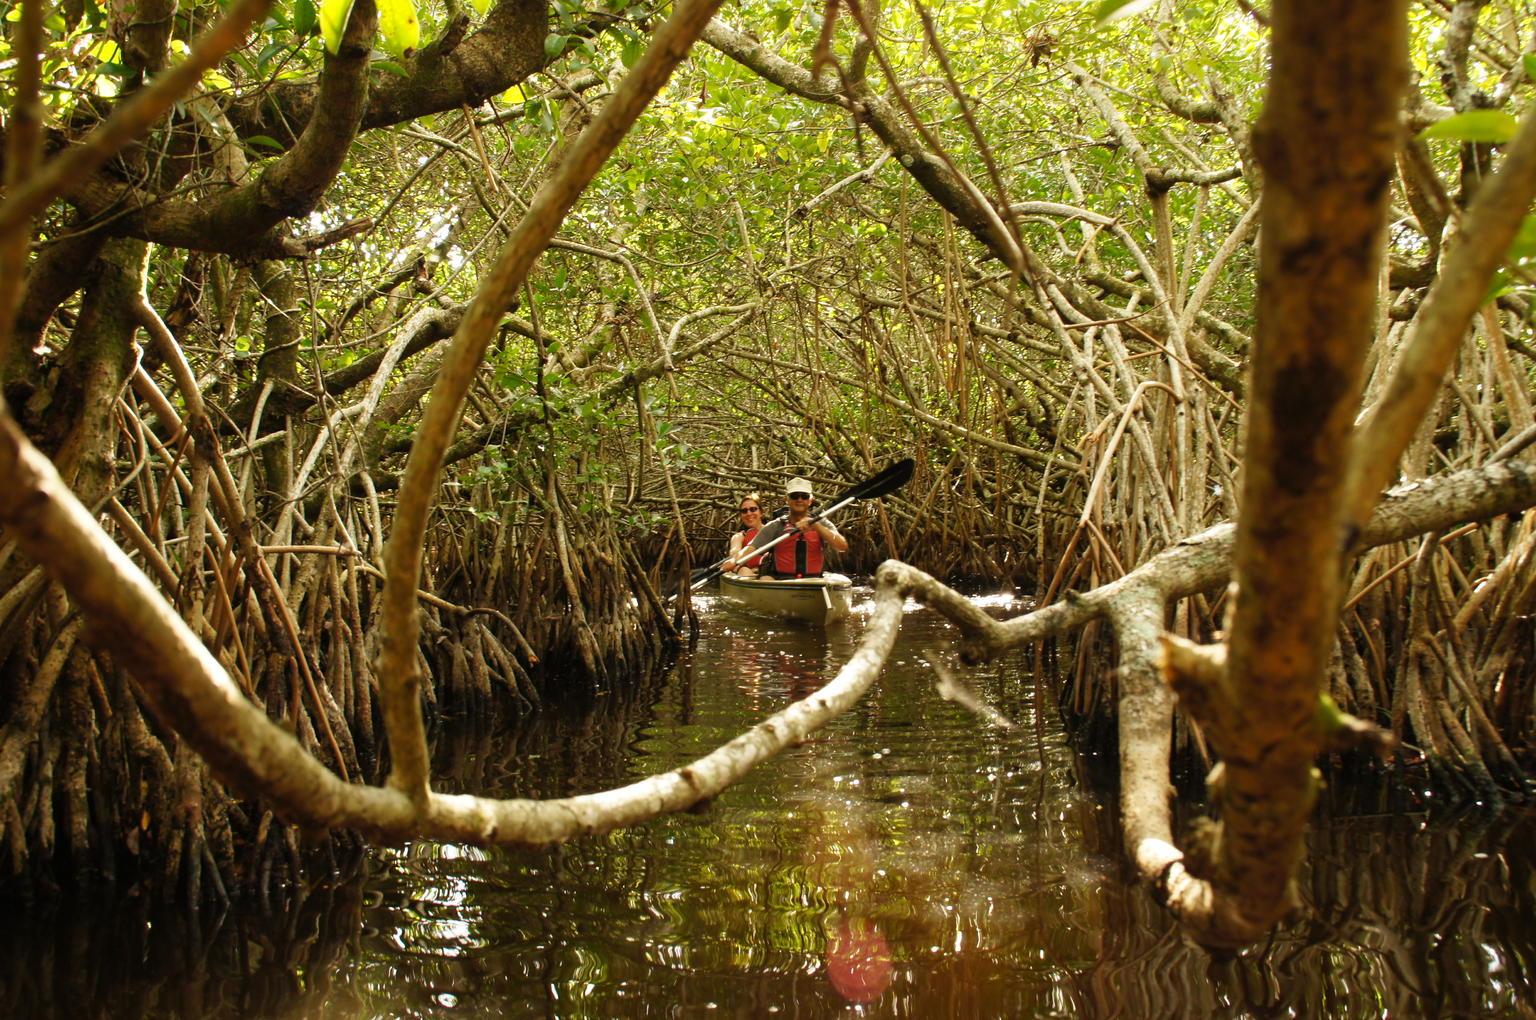 MORE PHOTOS, Mangrove Tunnel Kayak Eco Tour